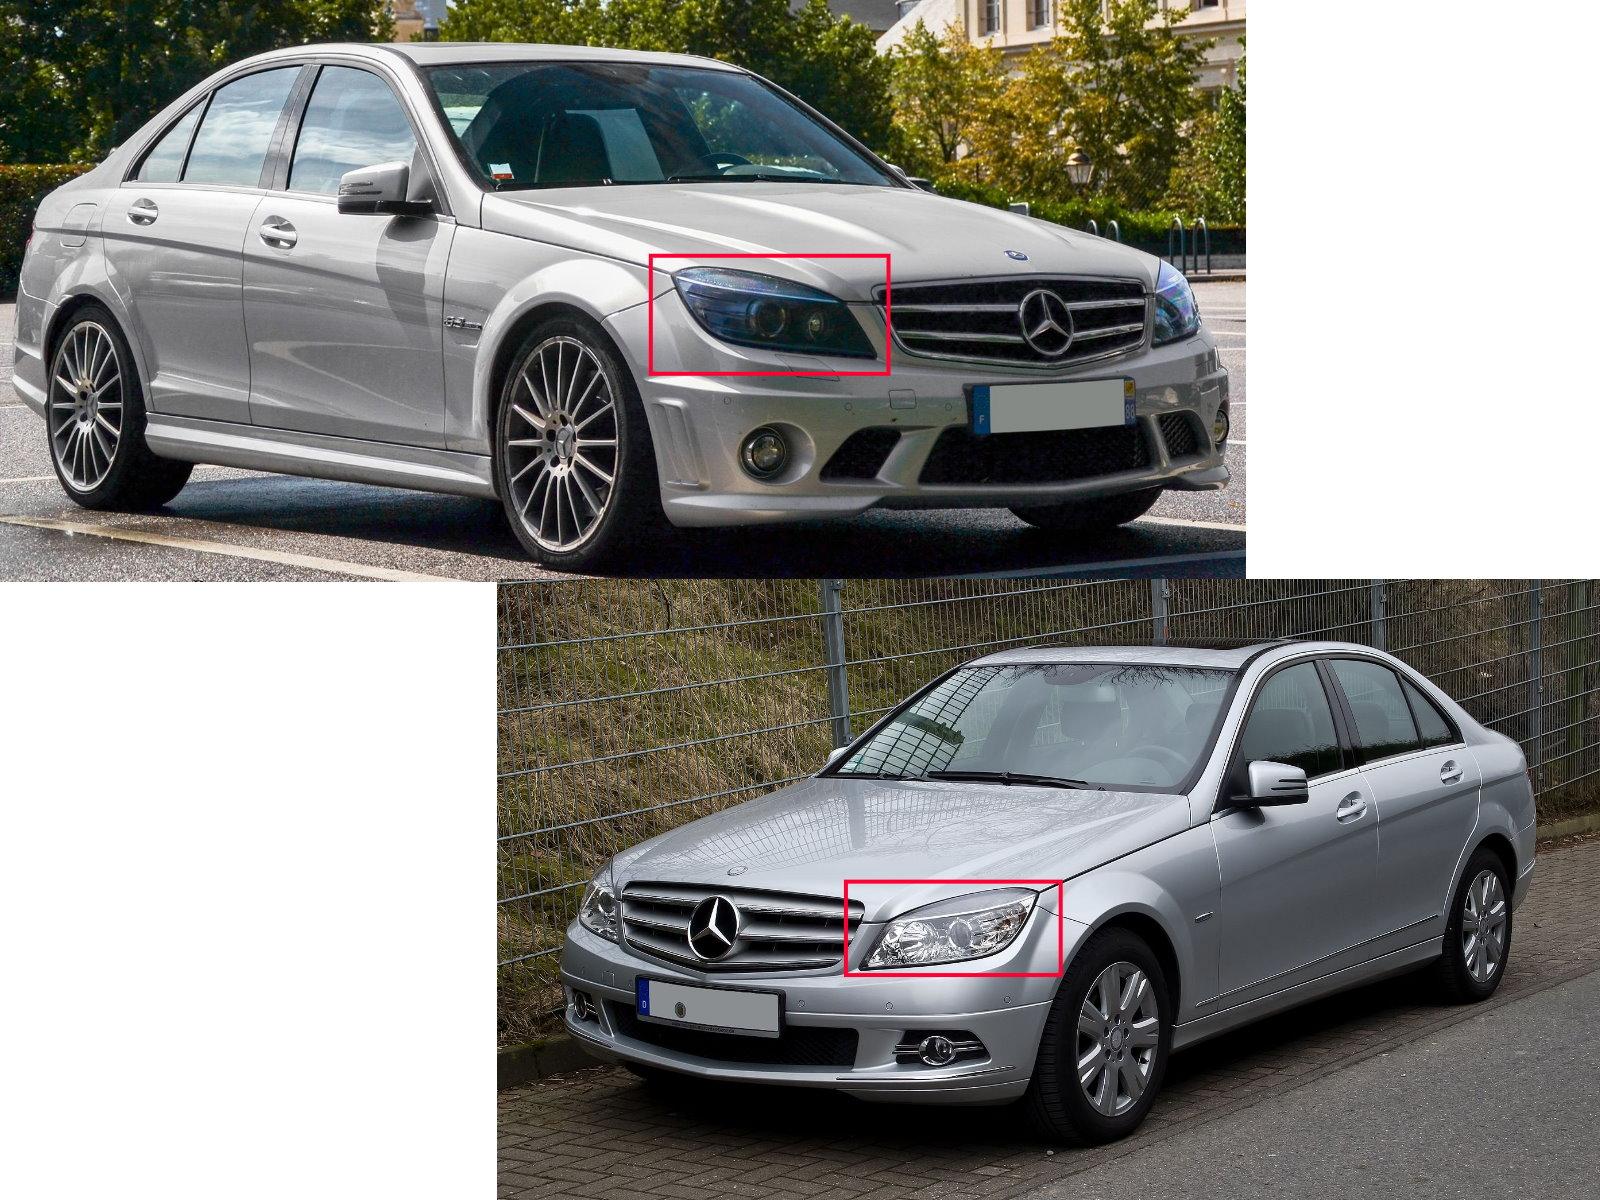 Details about W204 08-11 PRE-FACELIFT Cotton LED Angel-Eye Headlight BK for  Mercedes-Benz RHD